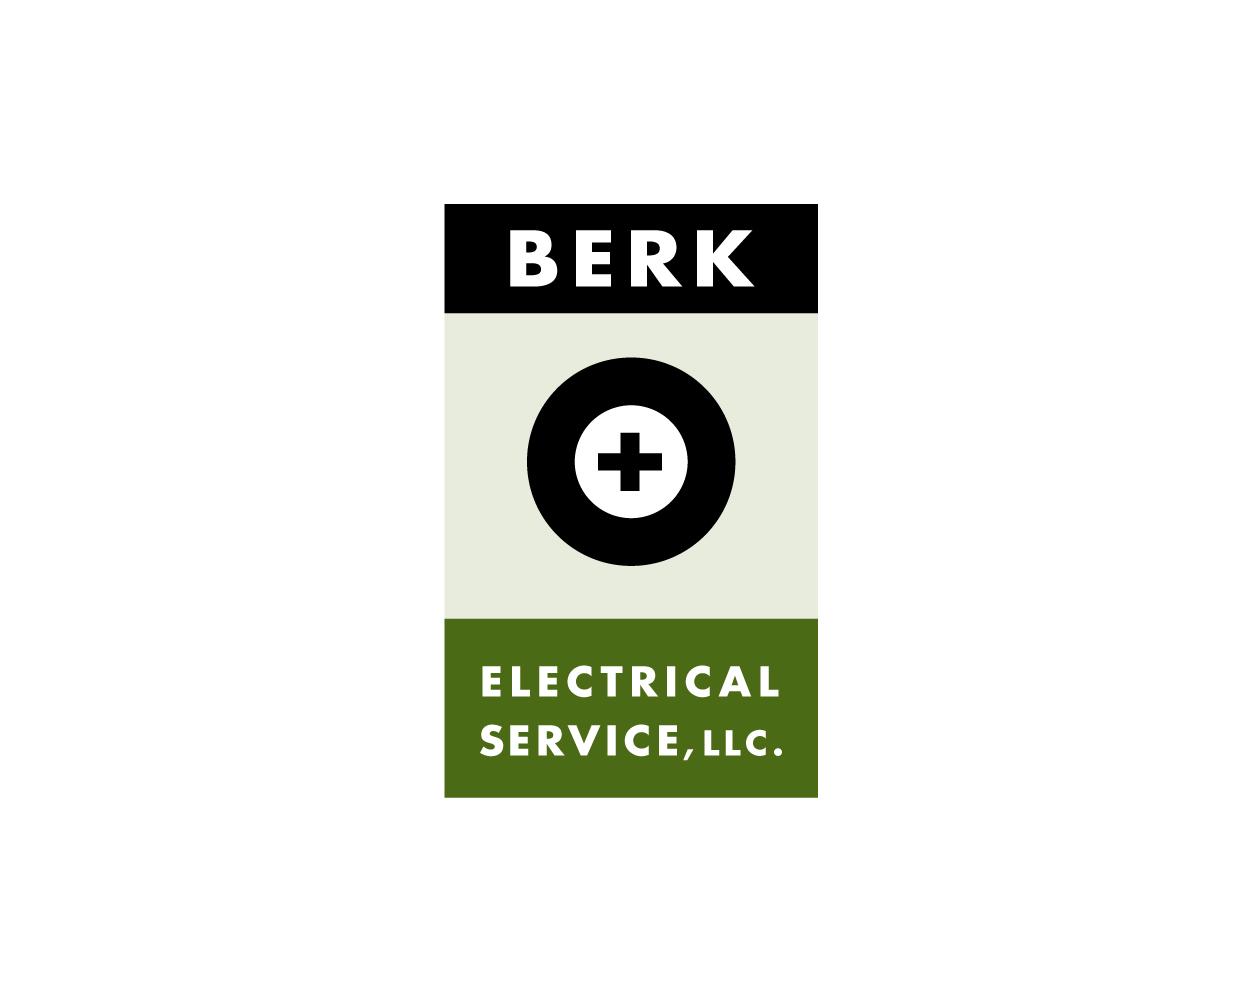 Berk Electrical Services | Identity